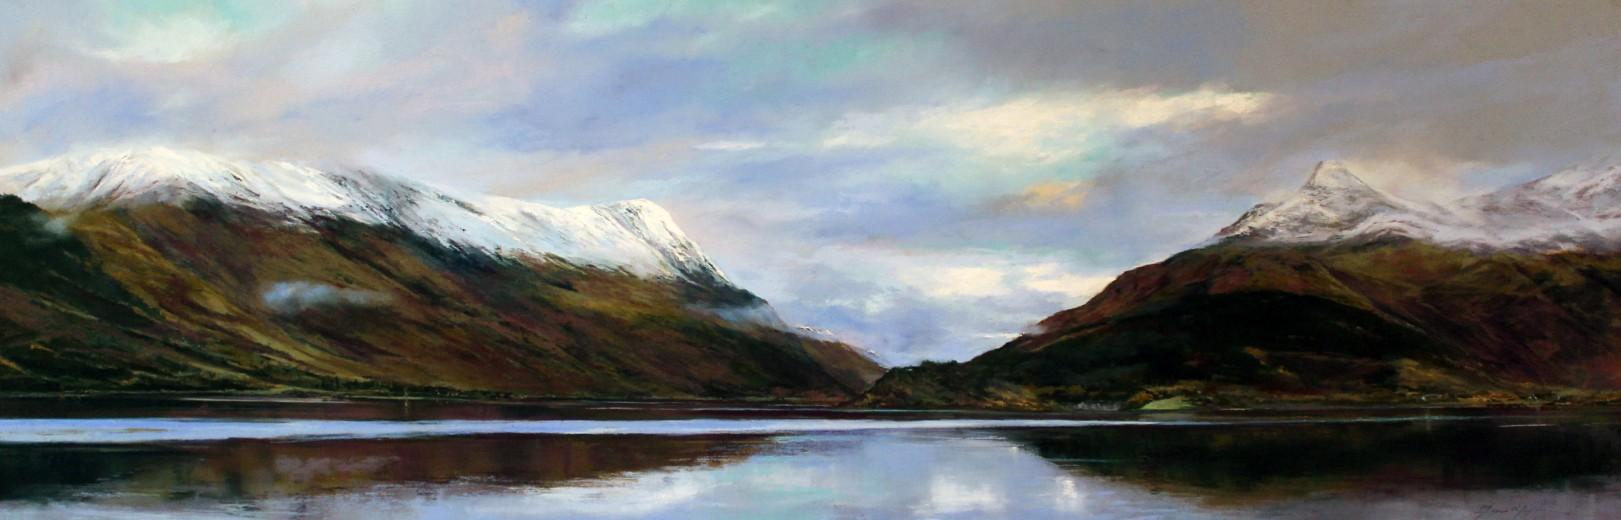 26_Fiona Haldane_Perfect Reflection,Loch Leven_Pastel_16x48